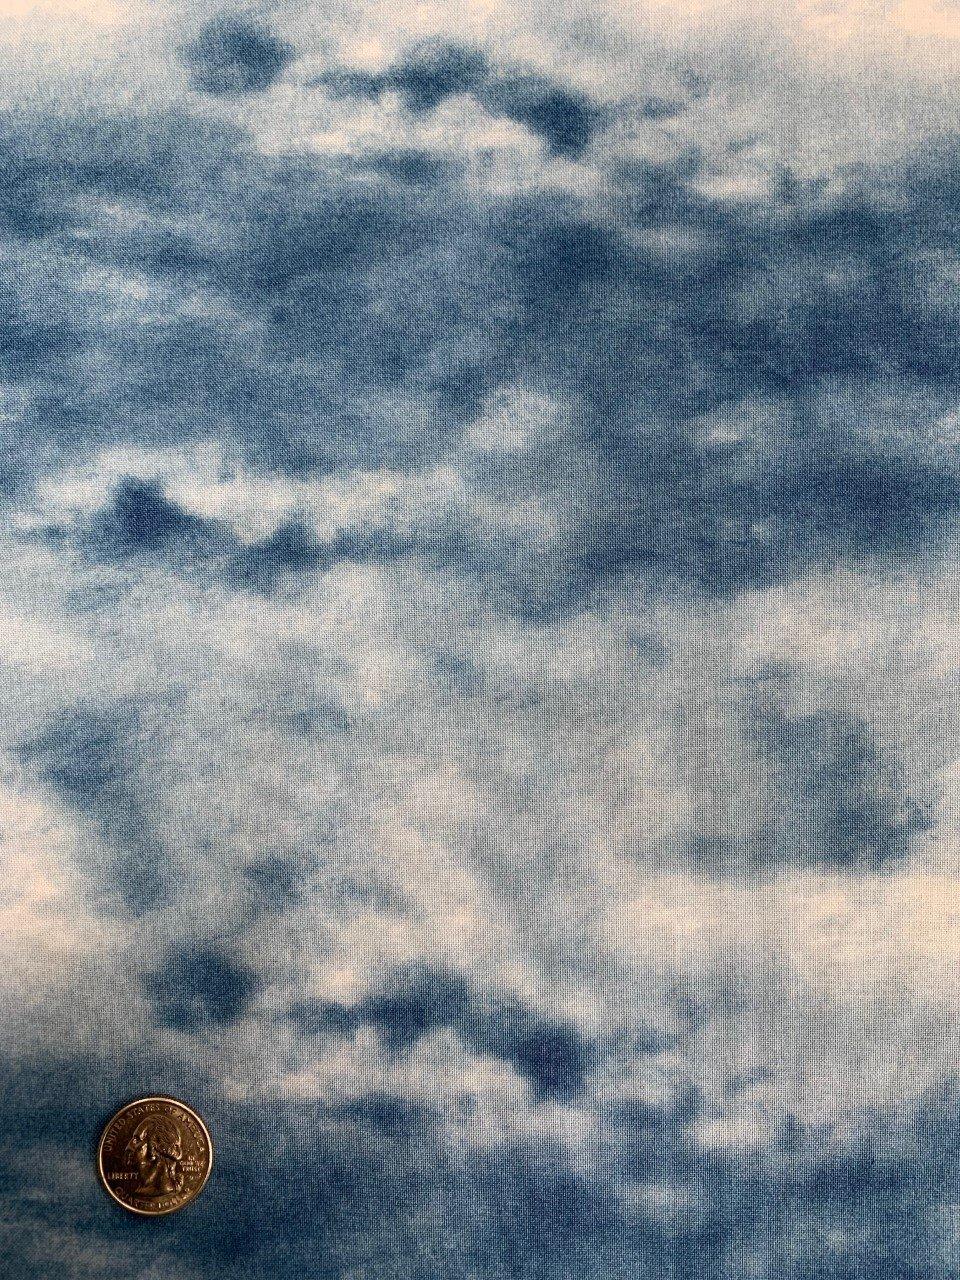 Winter Stillness - #1427-94773-491S - By Carolyn Mock